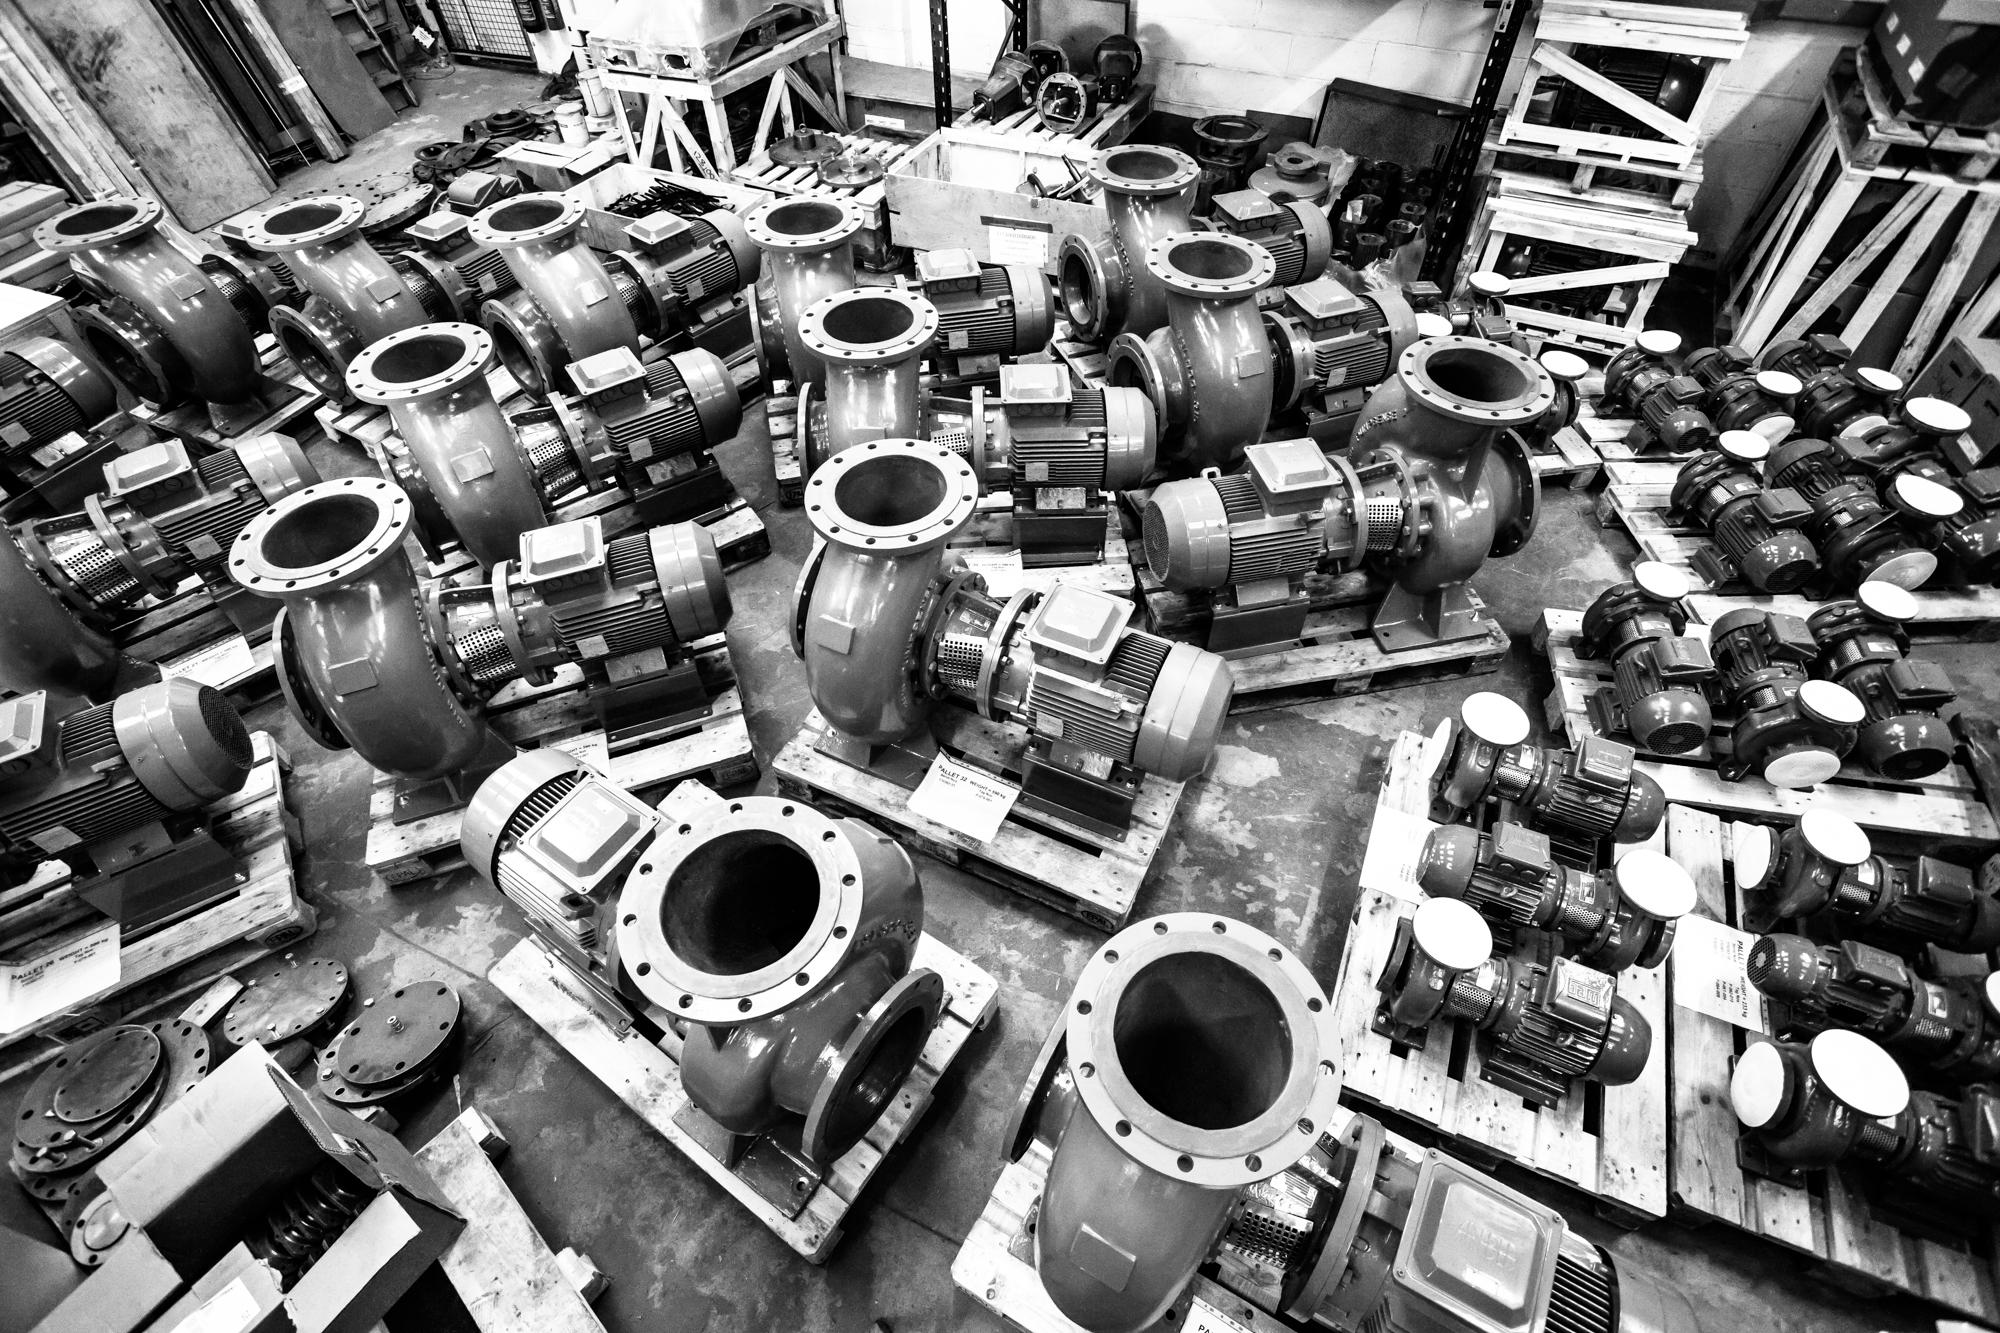 2018-06-25 Apex Pumps 239.jpg